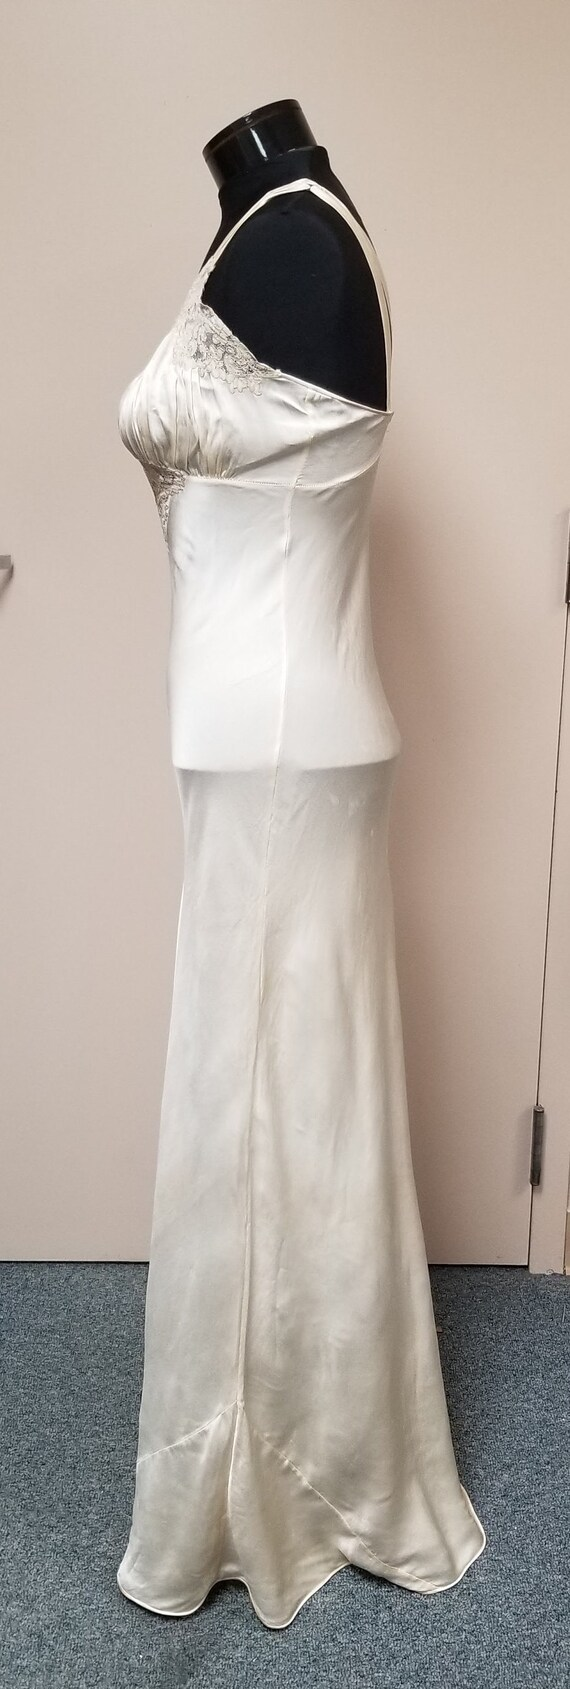 1930's Silk Bias  Night Gown - image 6